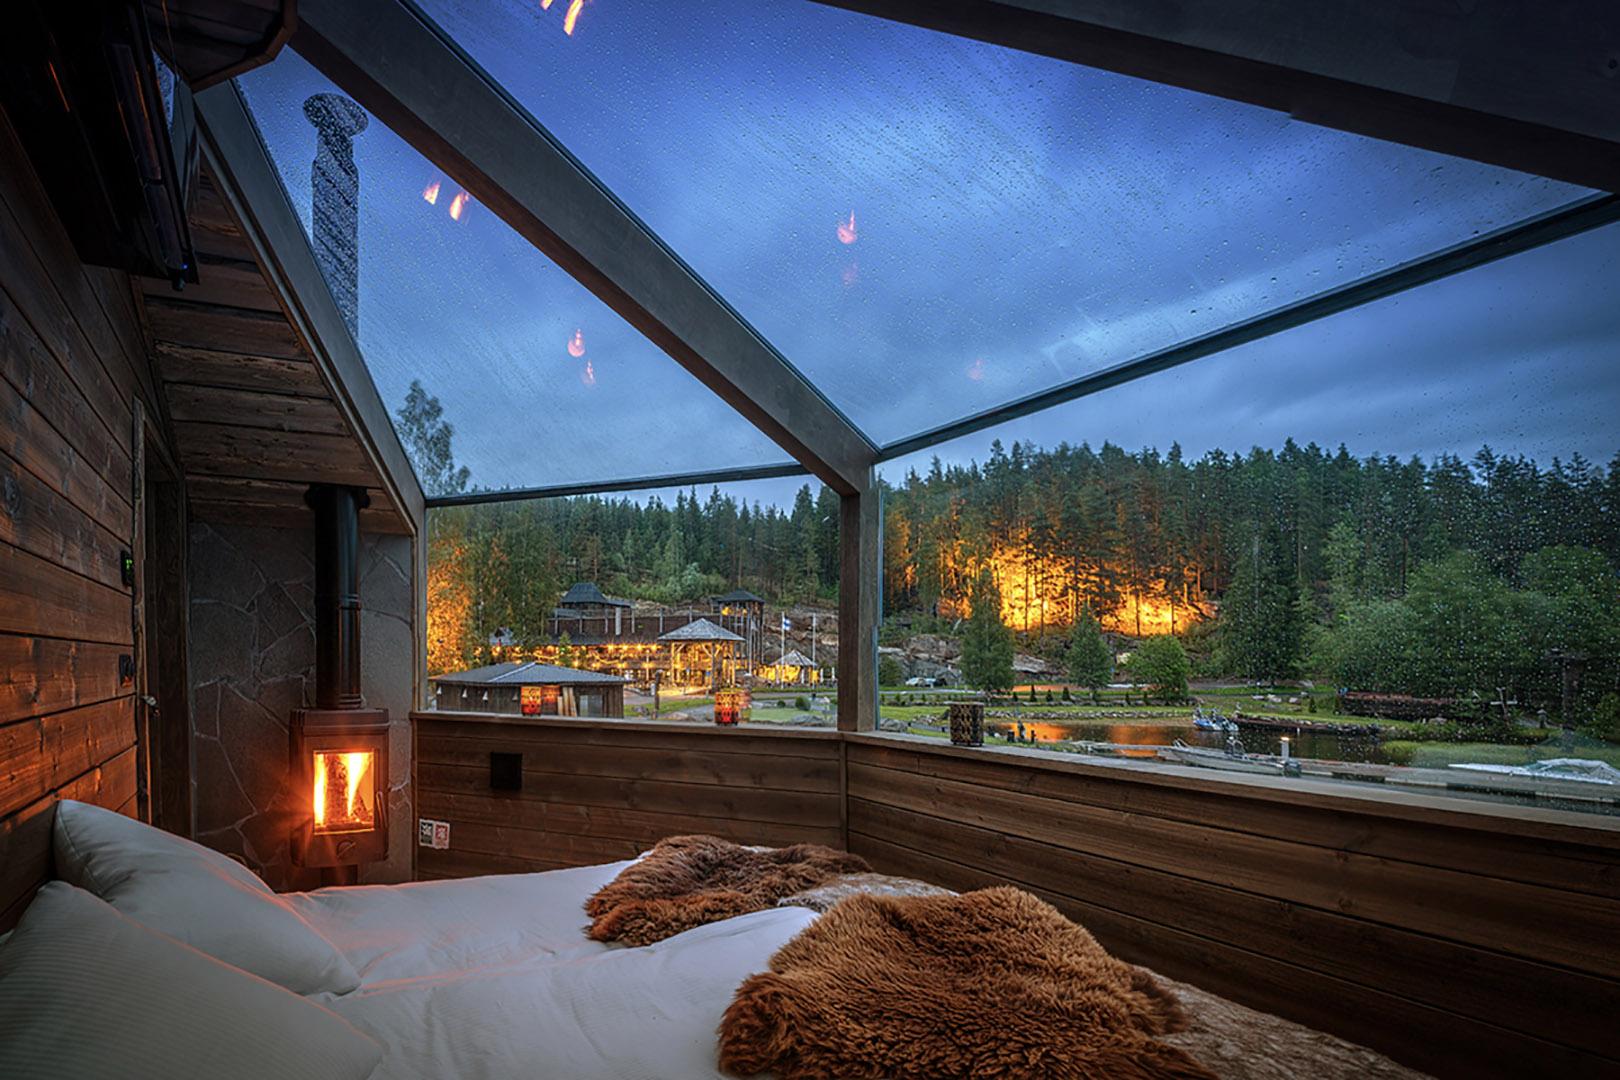 Jarvisydan_3_Scenery suite_Hotel & Spa Resort Jarvisydan